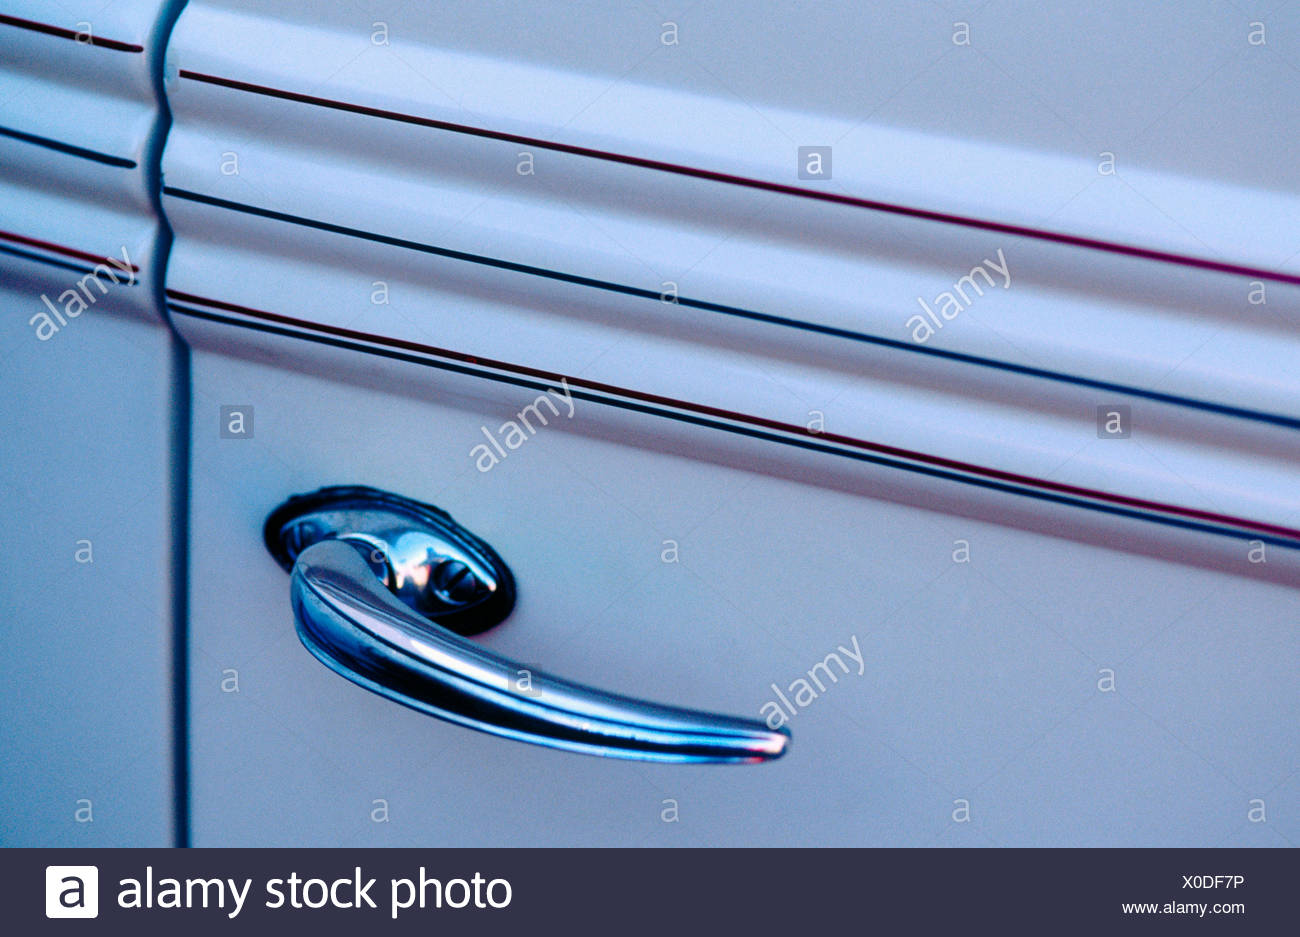 Antique car door handle - Antique Car Door Handle Stock Photo: 275663242 - Alamy